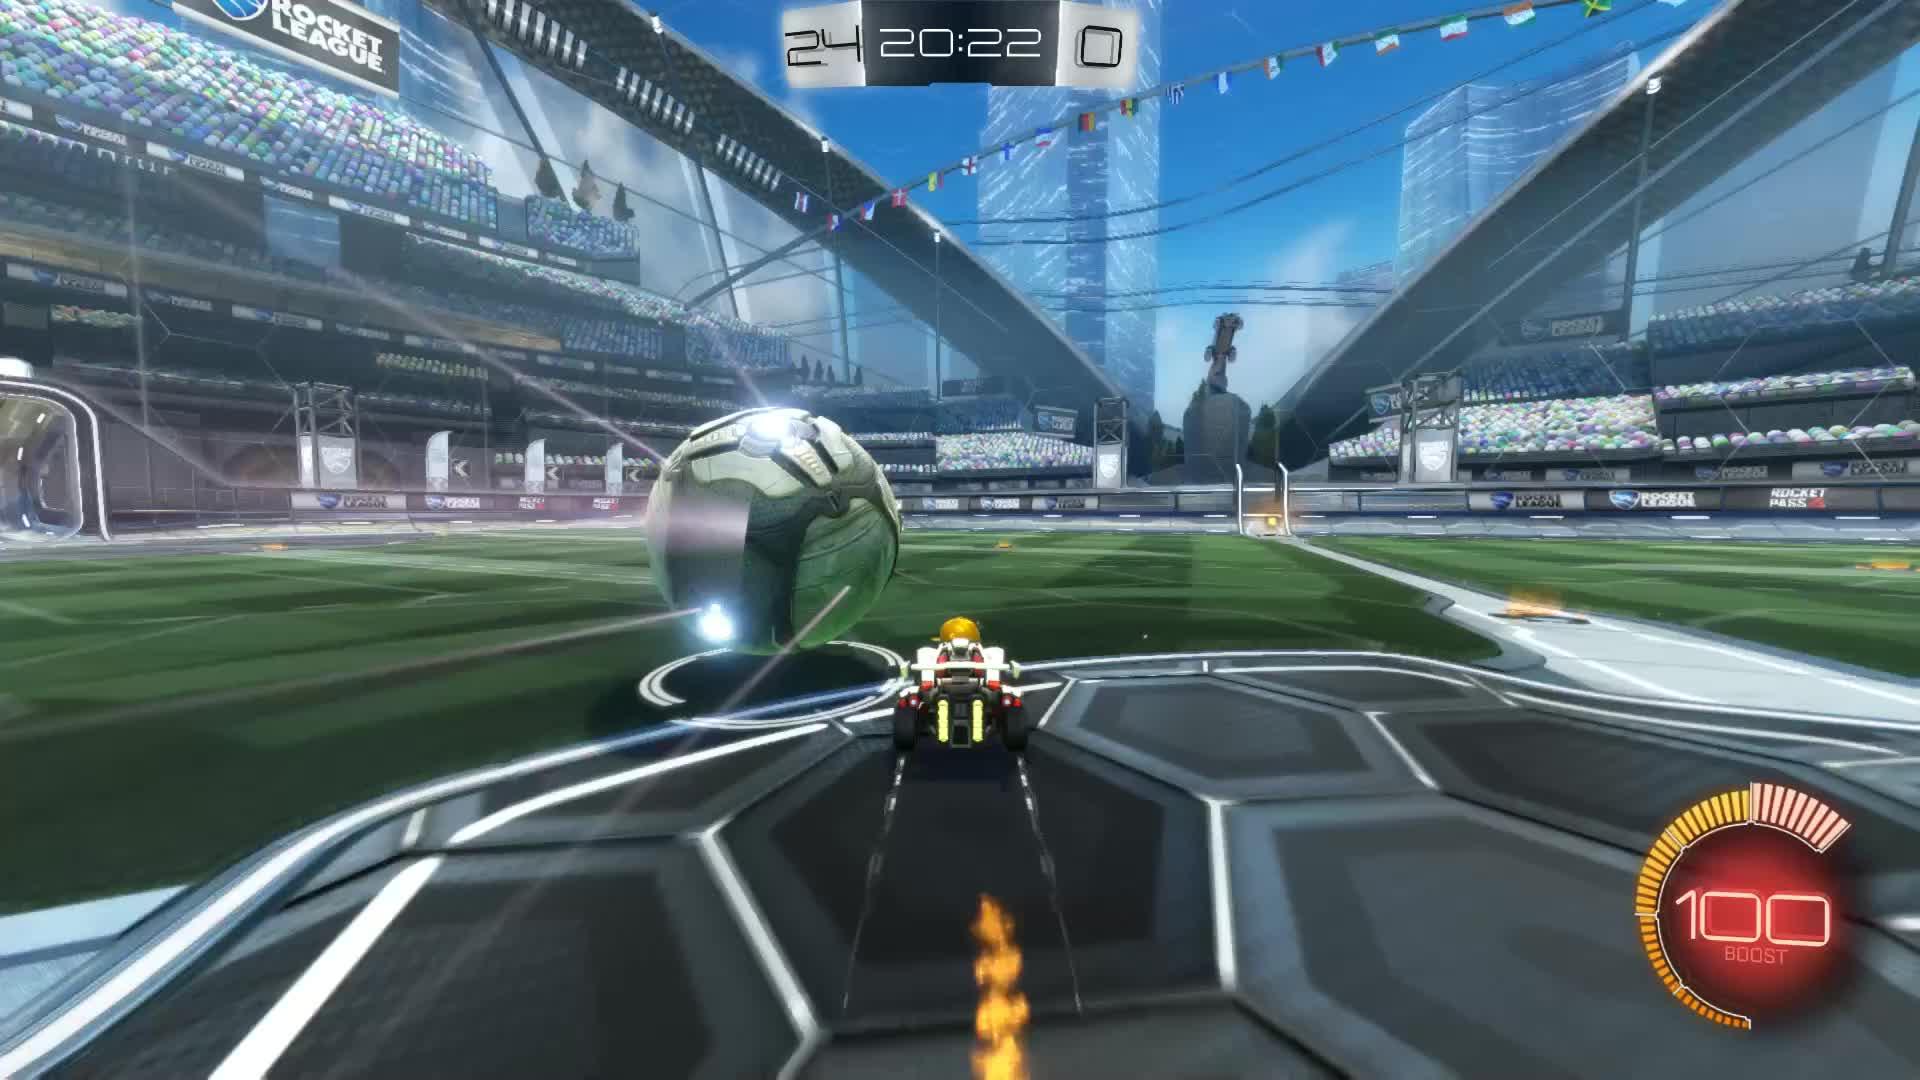 Burb, Gif Your Game, GifYourGame, Goal, Rocket League, RocketLeague, Goal 1: Burb GIFs